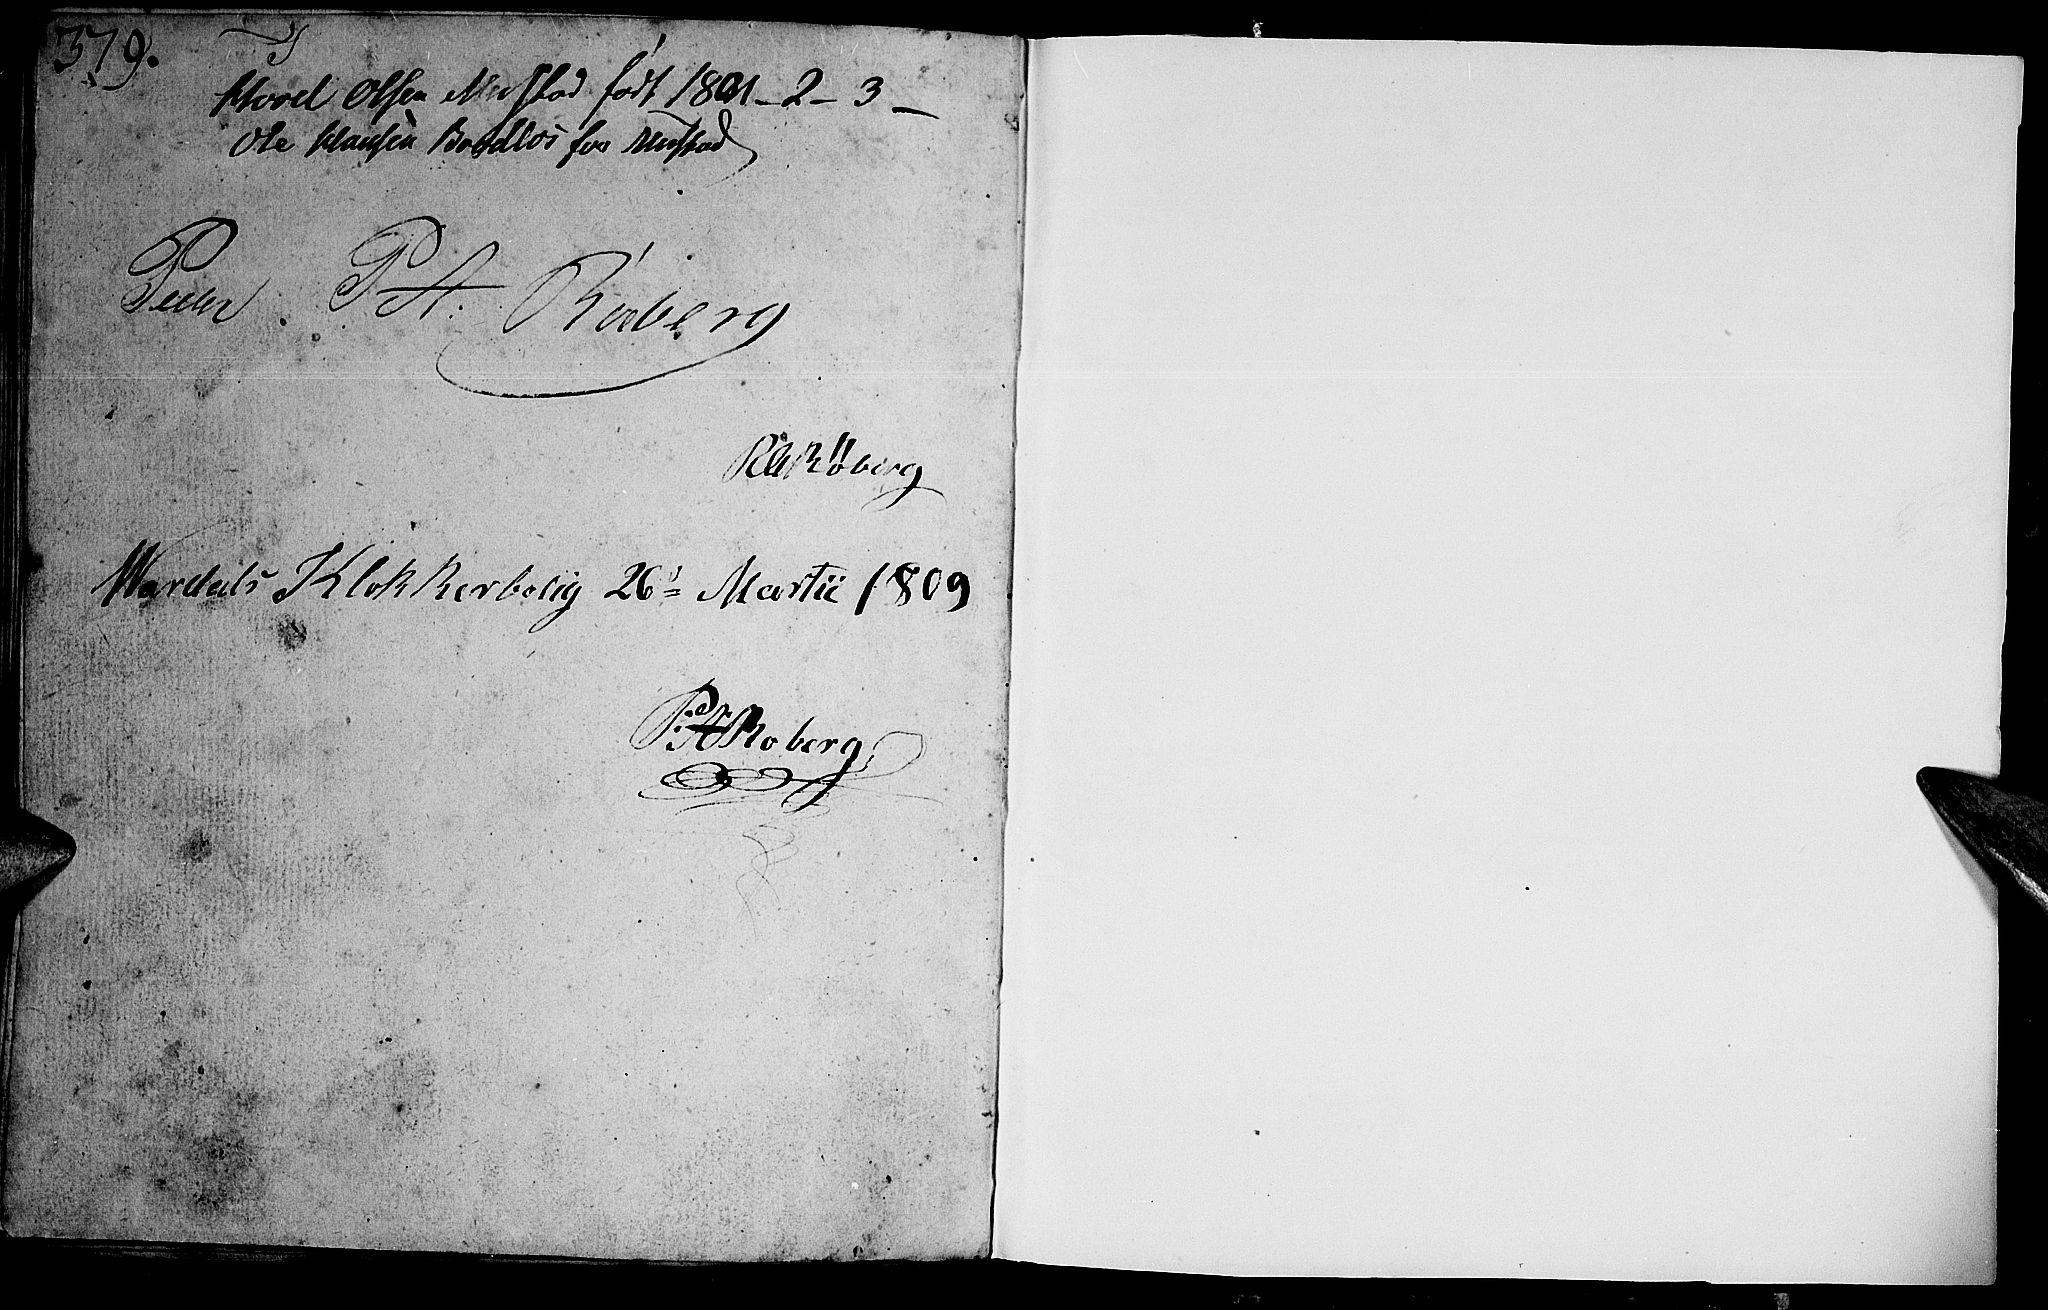 SAH, Vardal prestekontor, H/Ha/Hab/L0003: Klokkerbok nr. 3, 1803-1808, s. 379-380